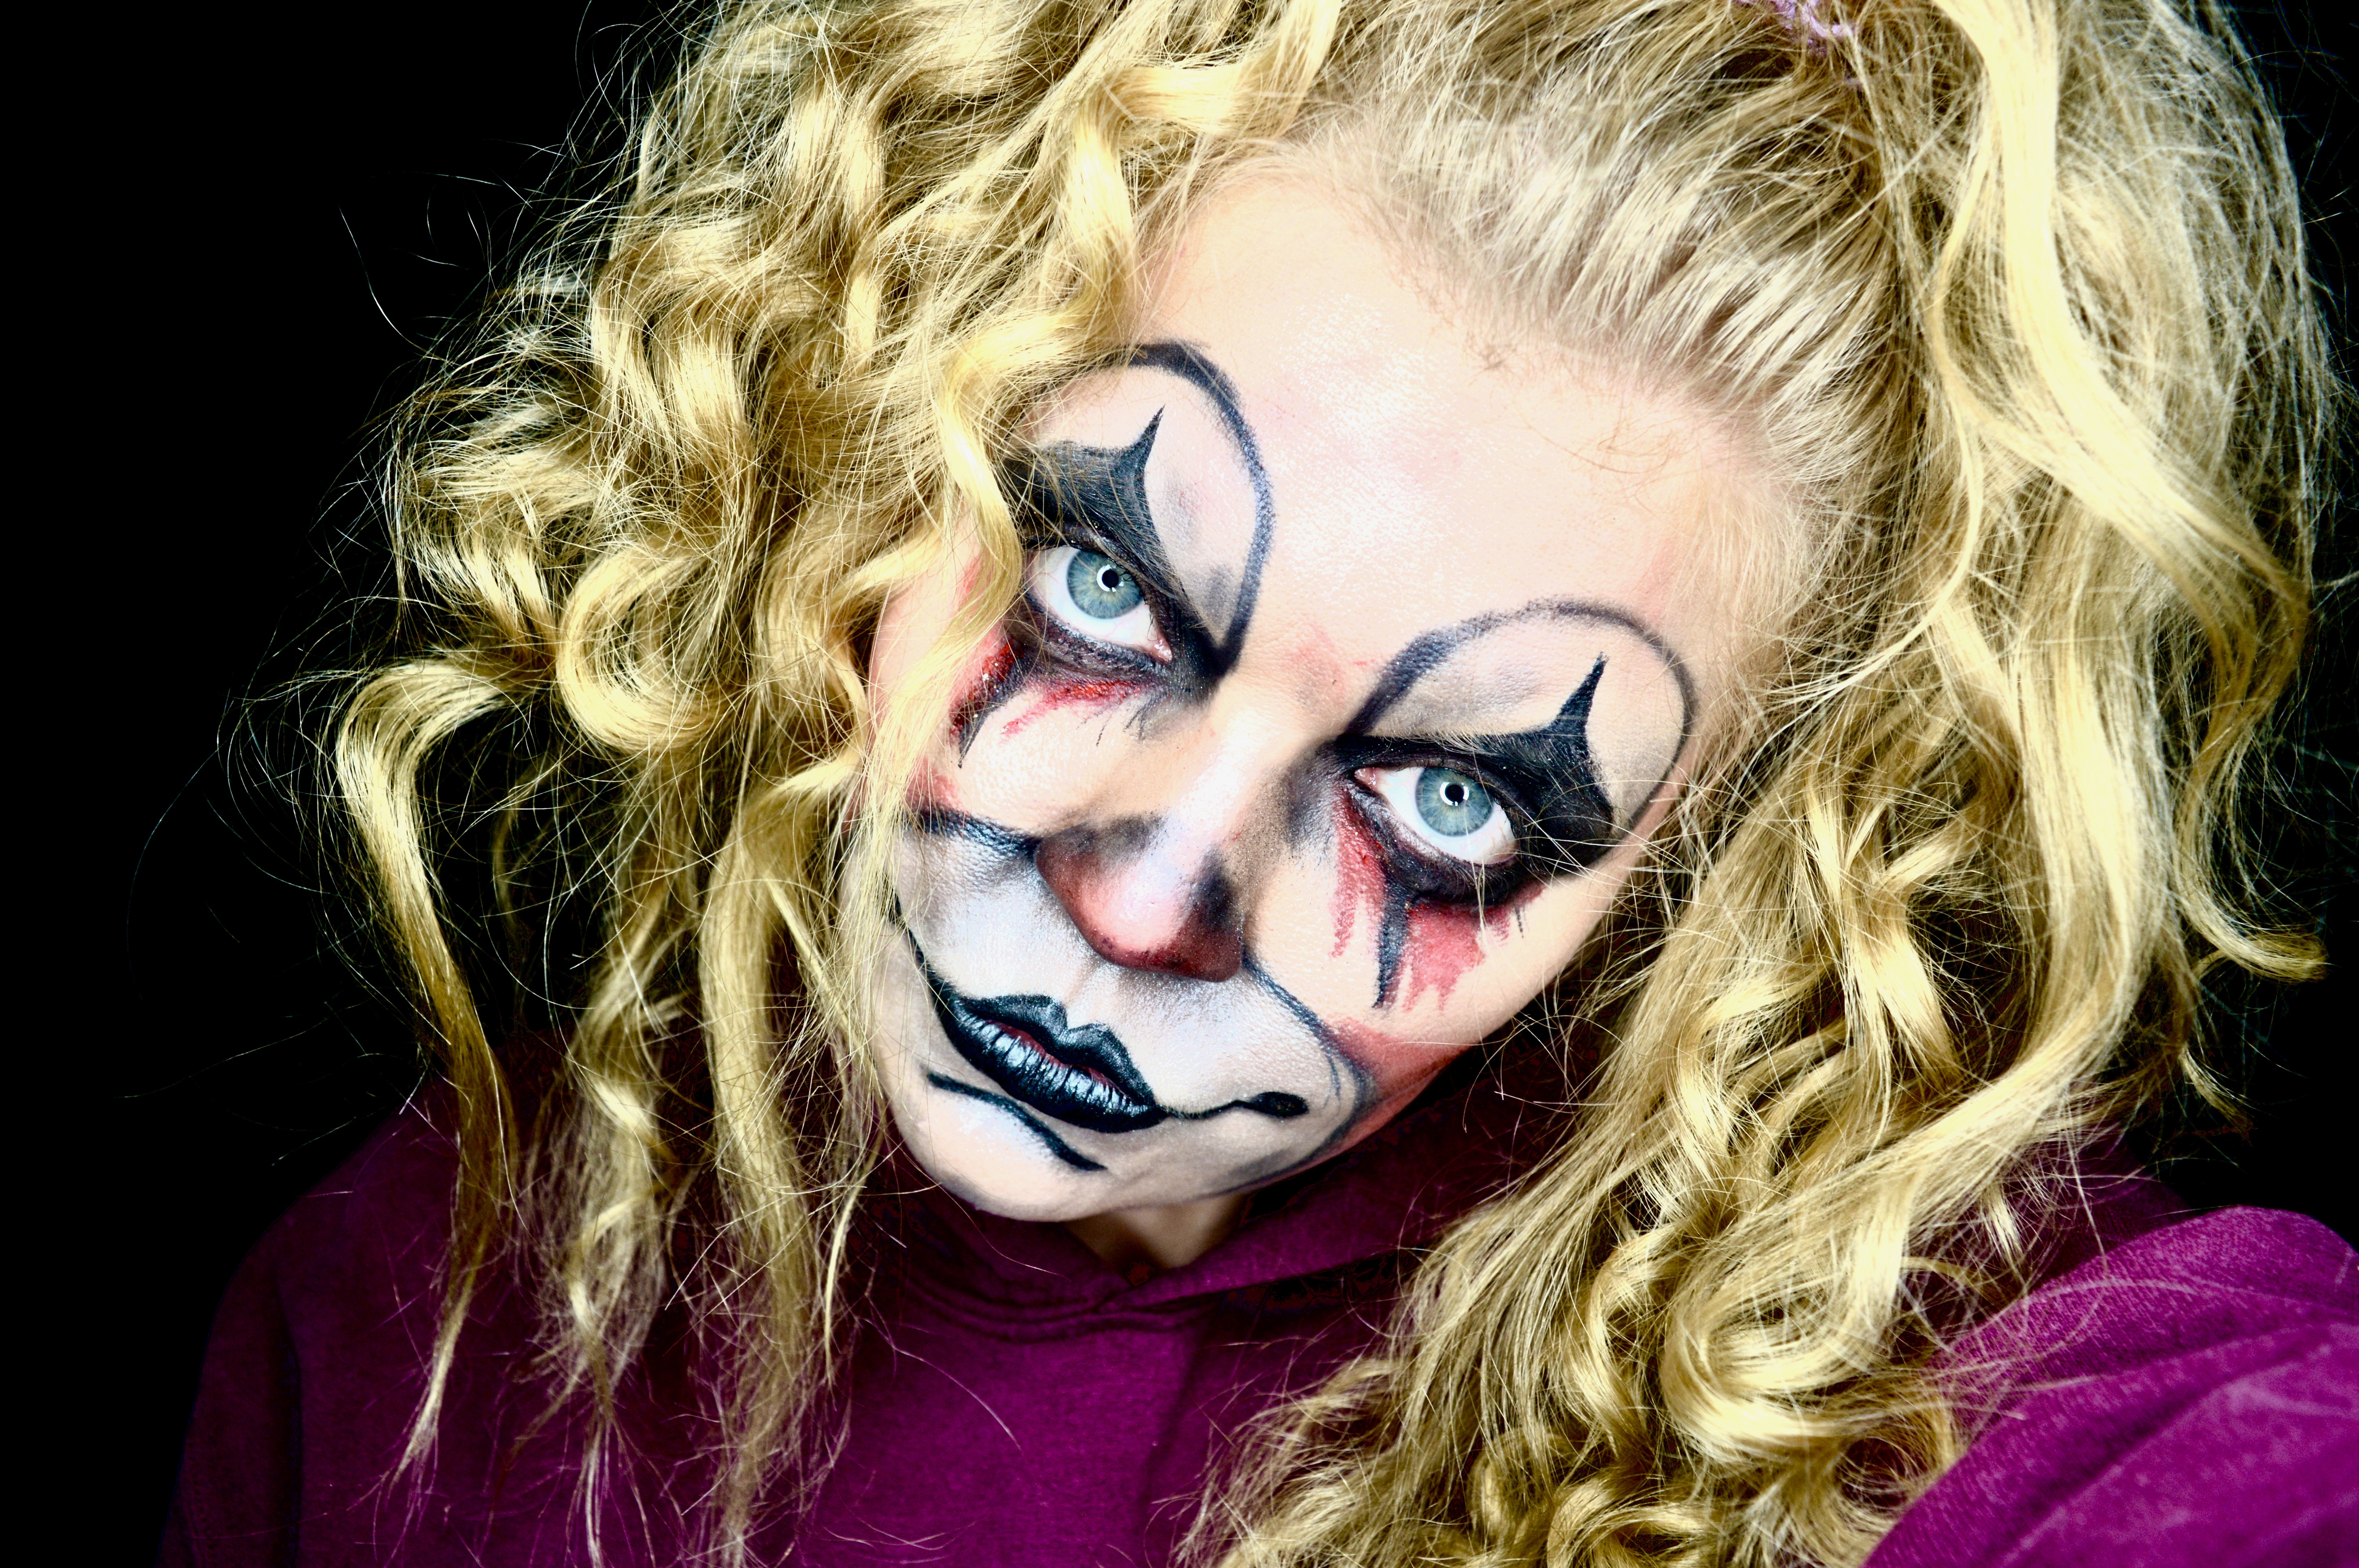 Scary Halloween Makeup ideas   Dead Blonde Clown   Elle Blonde Luxury Lifestyle Destination Blog